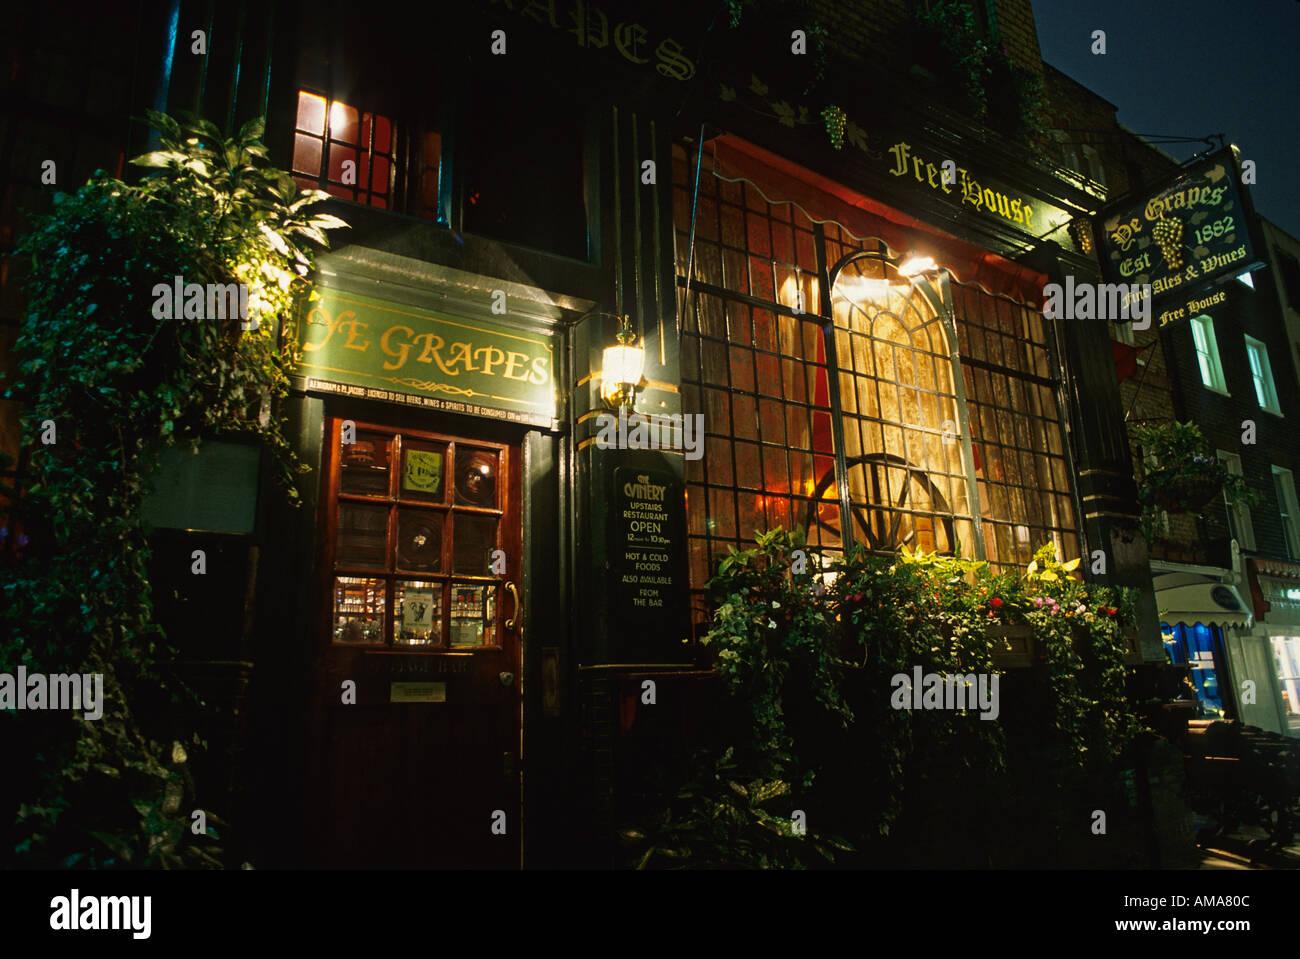 England London Mayfair Shepherd Market Ye Grapes pub exterior night - Stock Image